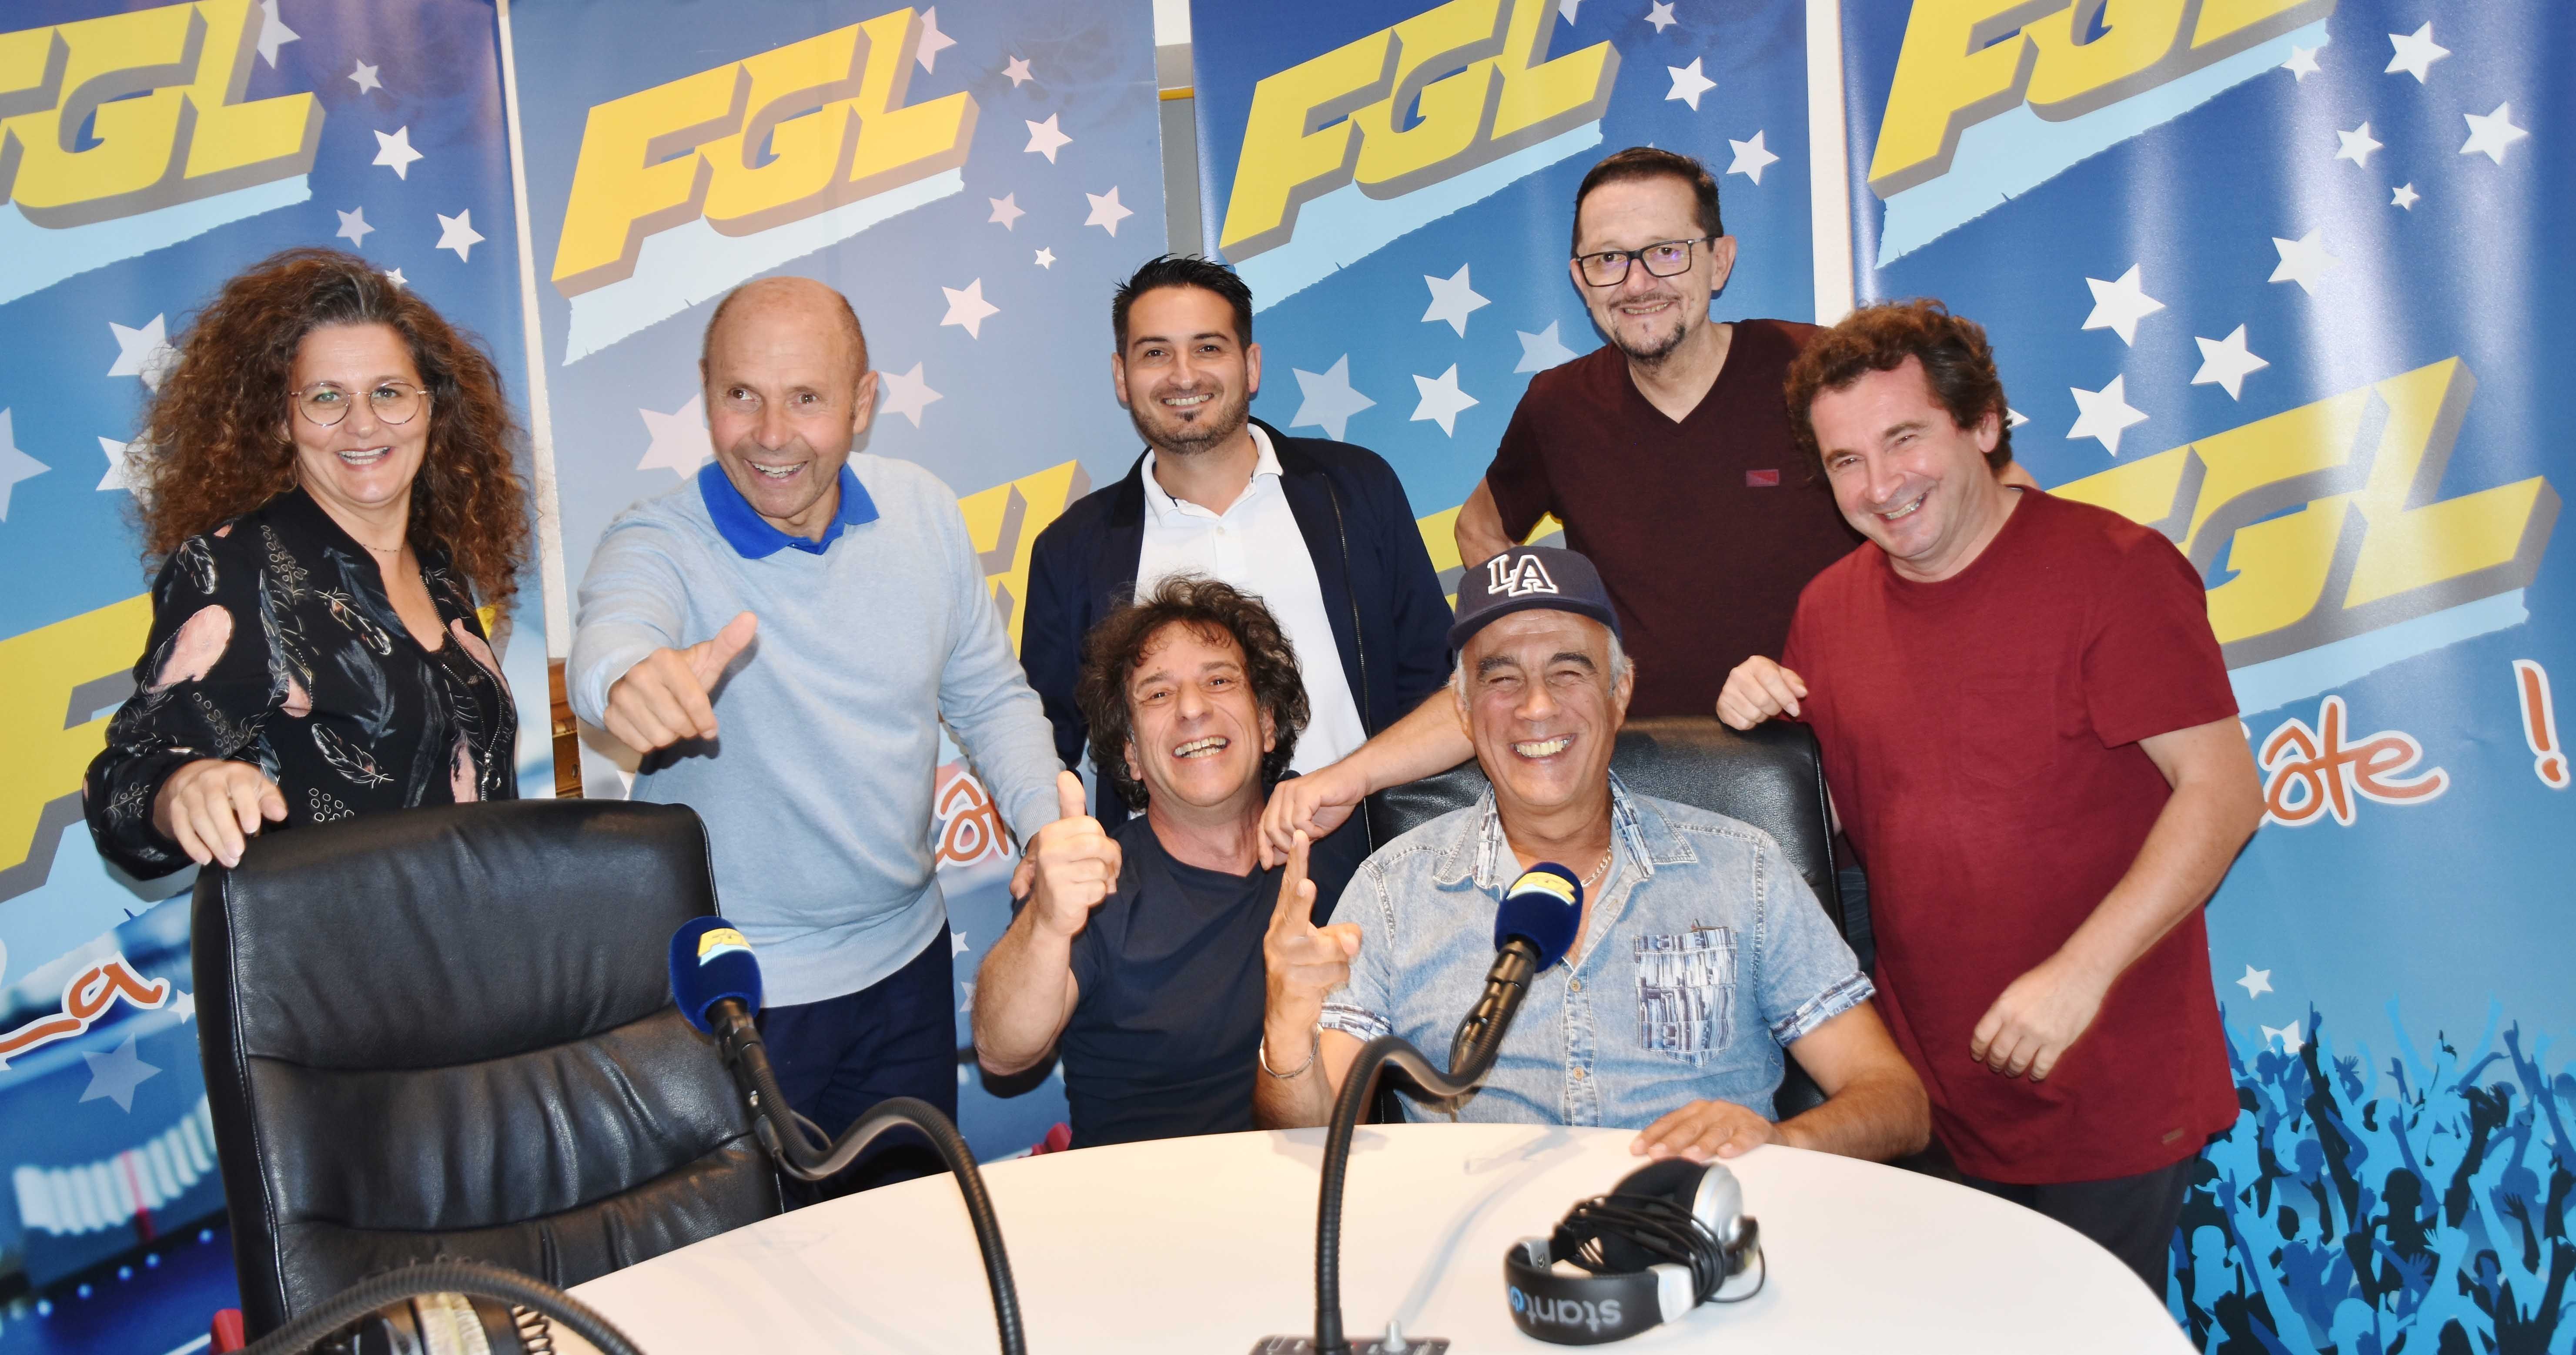 L'équipe de FGL attaque la saison tout sourire ! © FGL